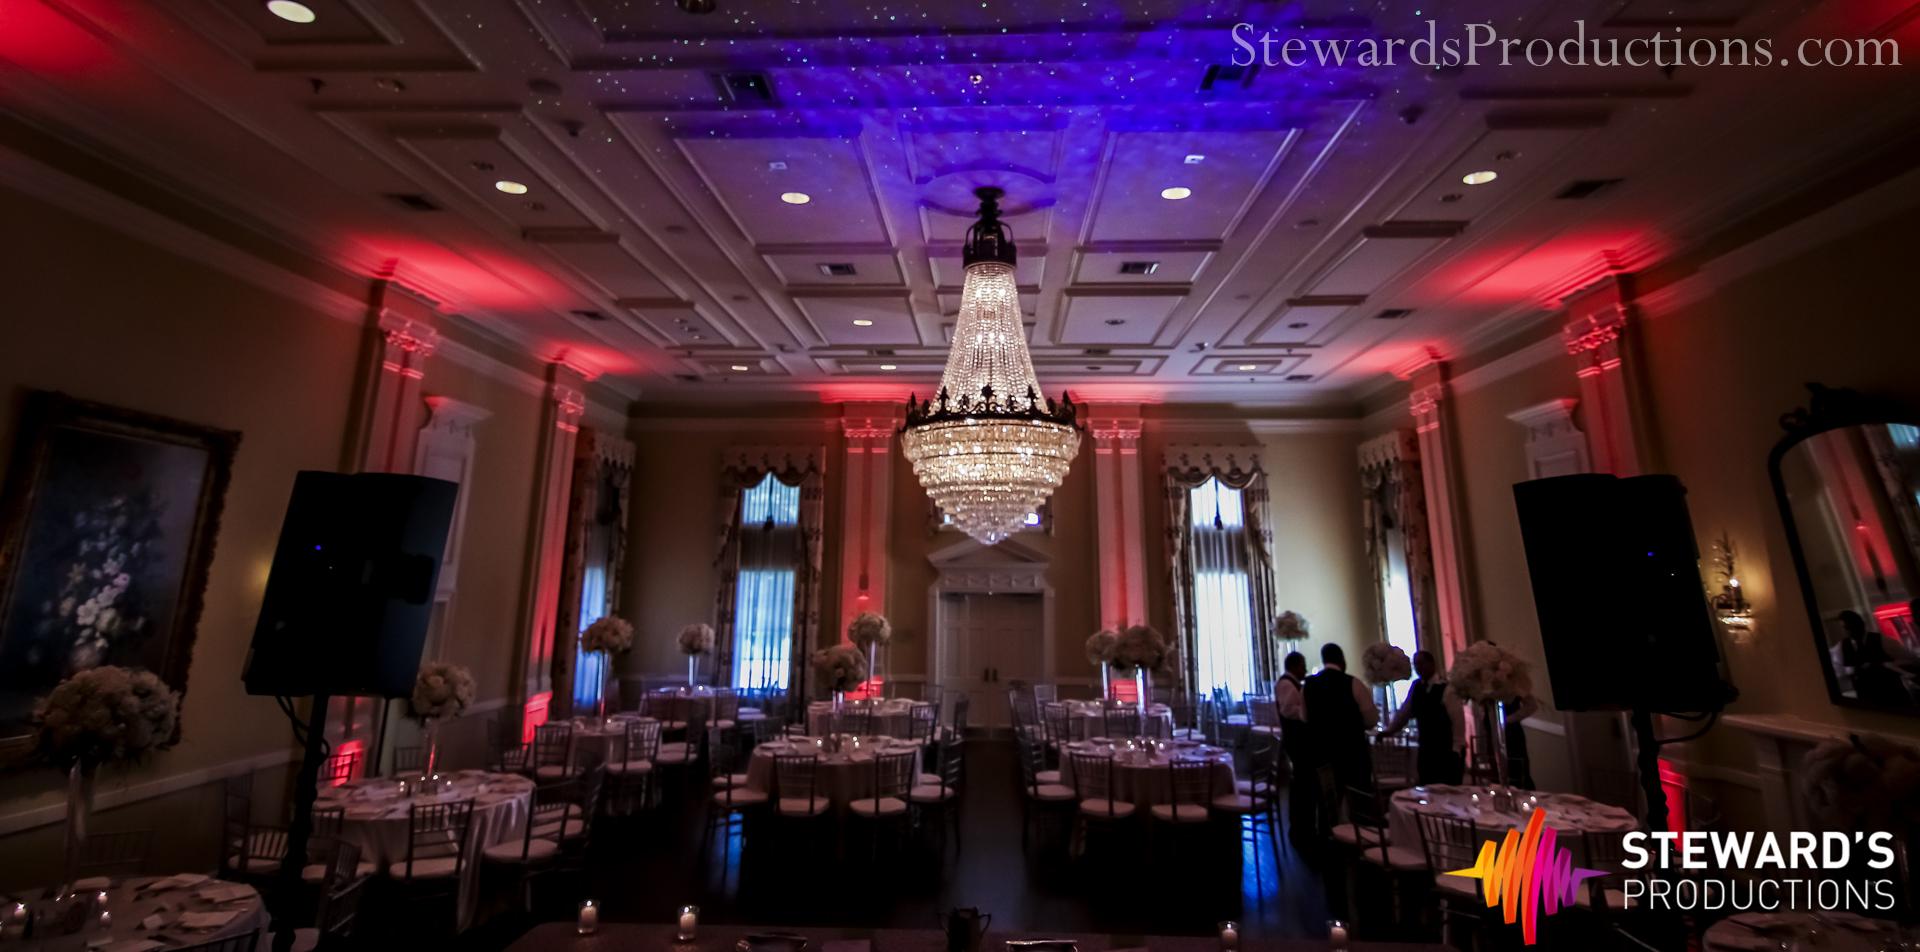 LED Up Lighting | Dallas Wedding DJ Stewardu0027s Productions Dallas DJ Videography & LED Up Lighting | Dallas Wedding DJ: Stewardu0027s Productions Dallas ... azcodes.com